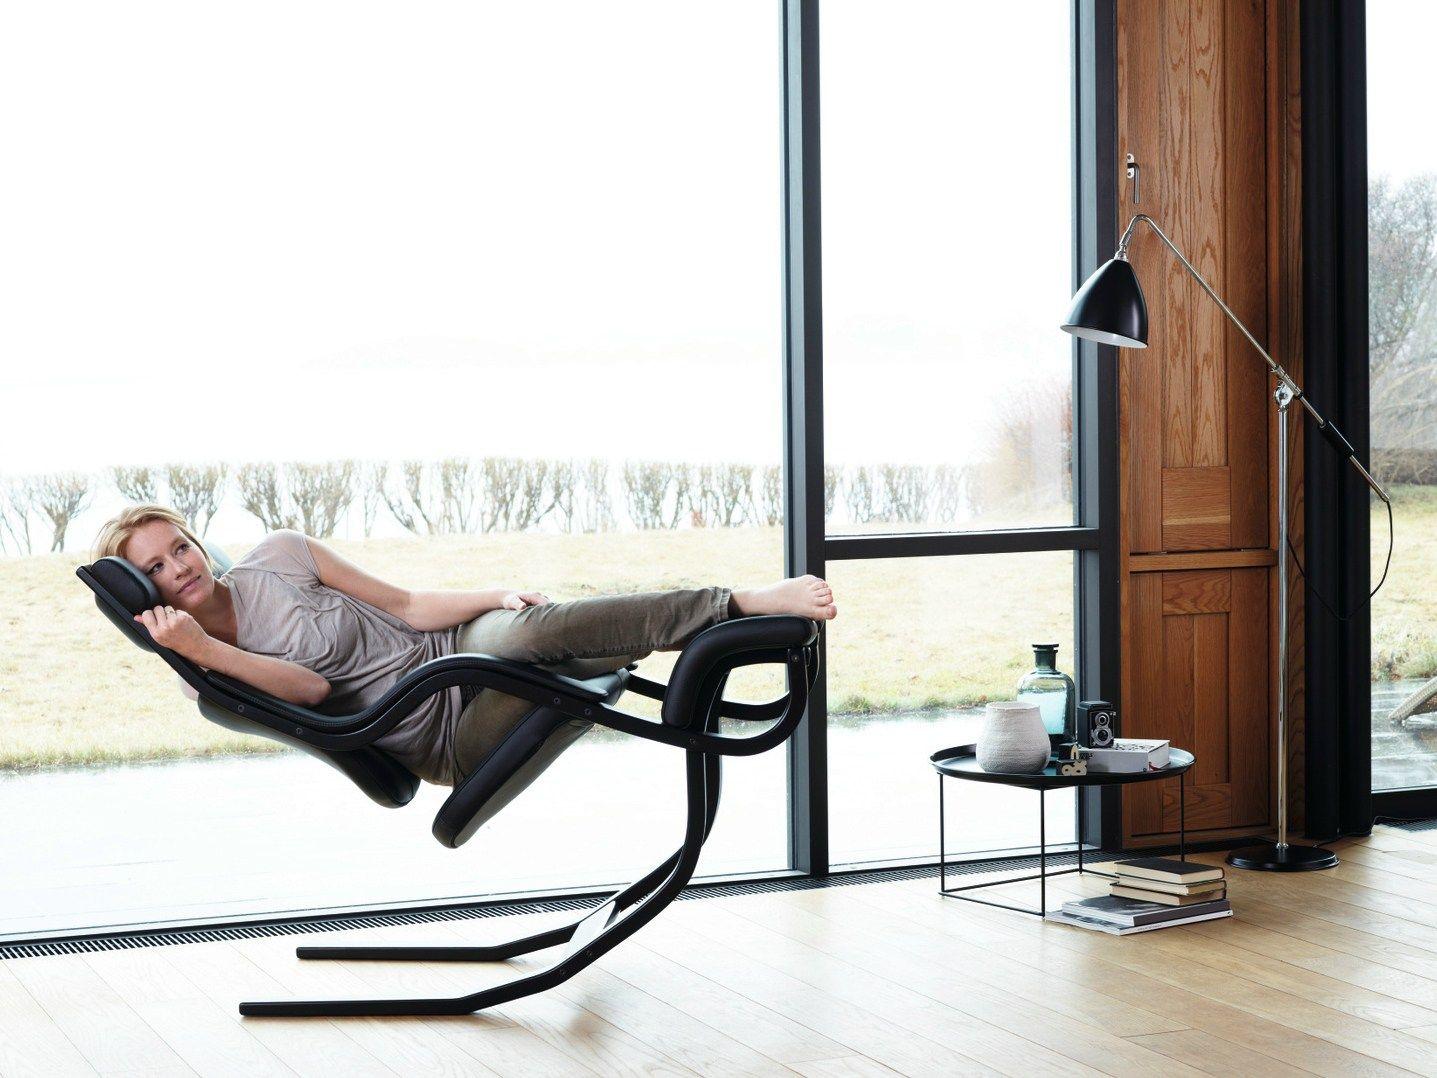 Office Workspace Ergonomic Black Reclining Office Chair